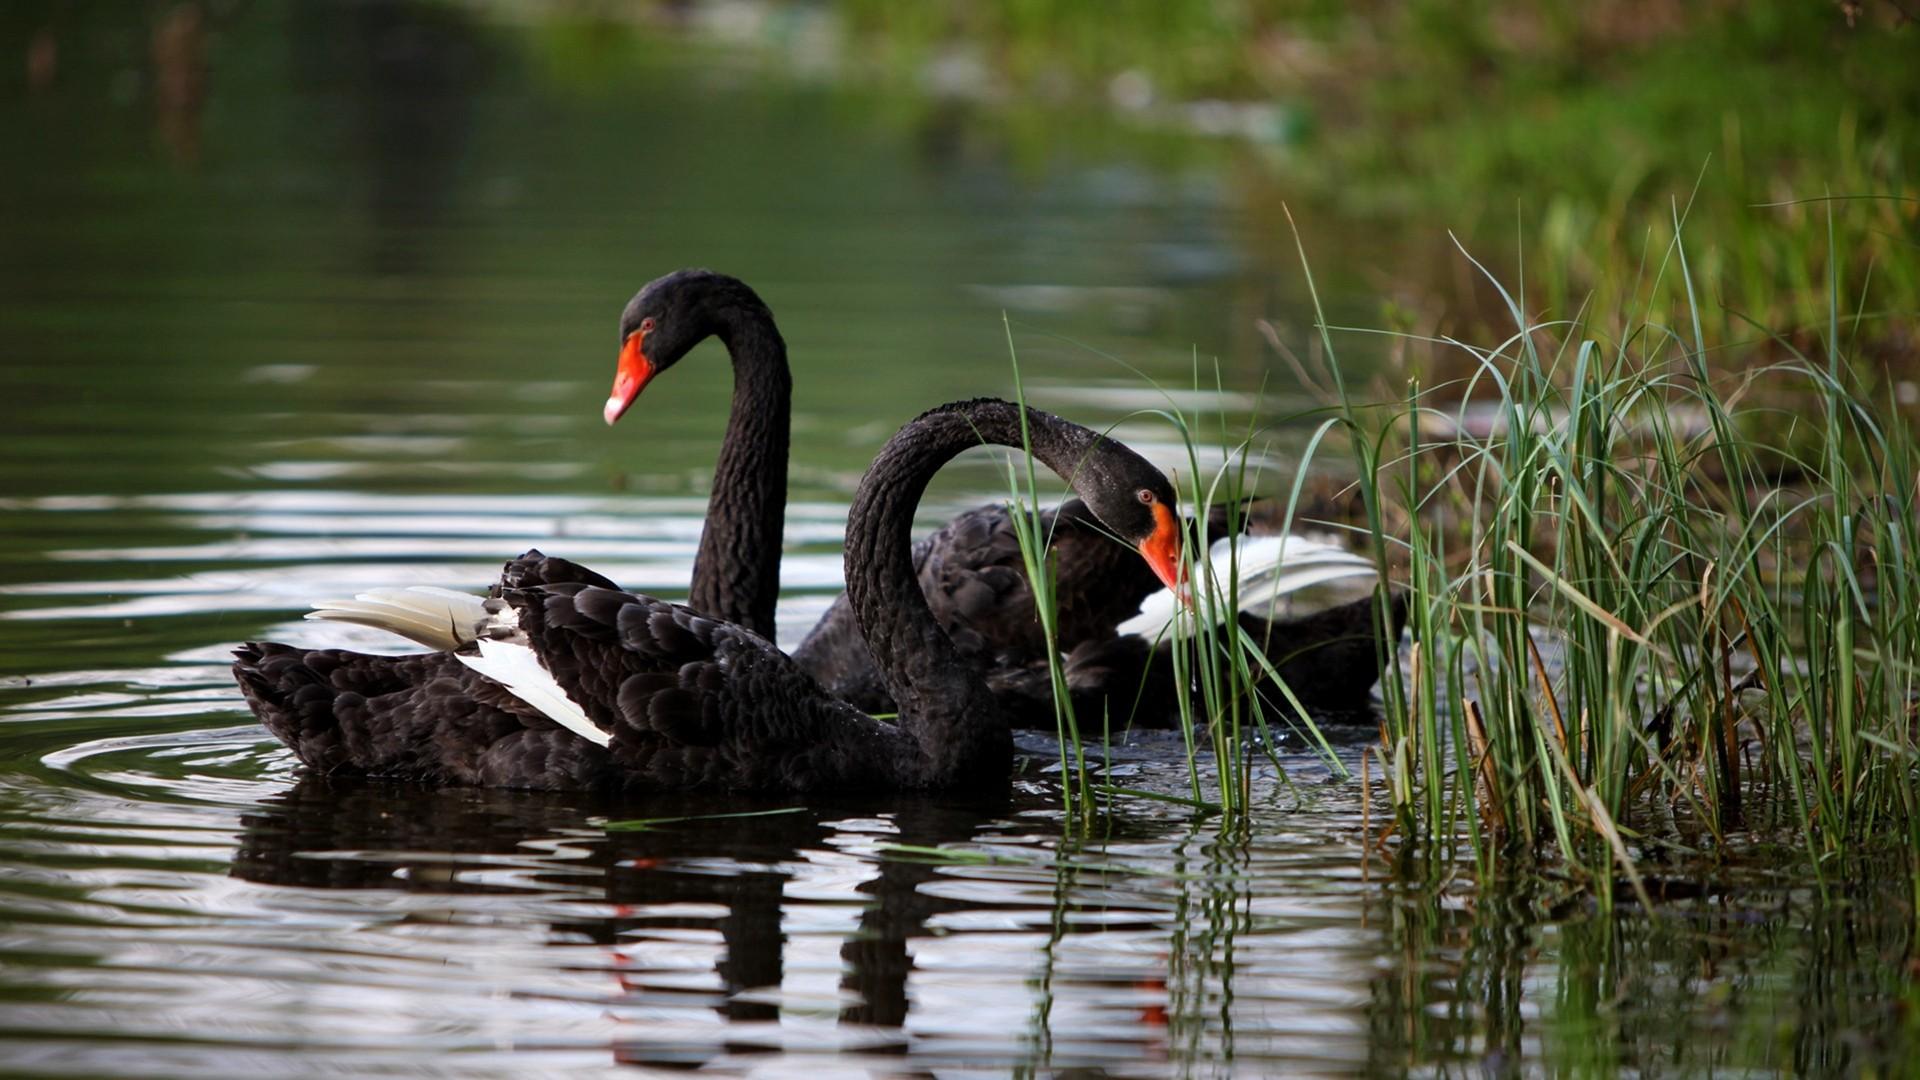 Swan Full HD Wallpaper